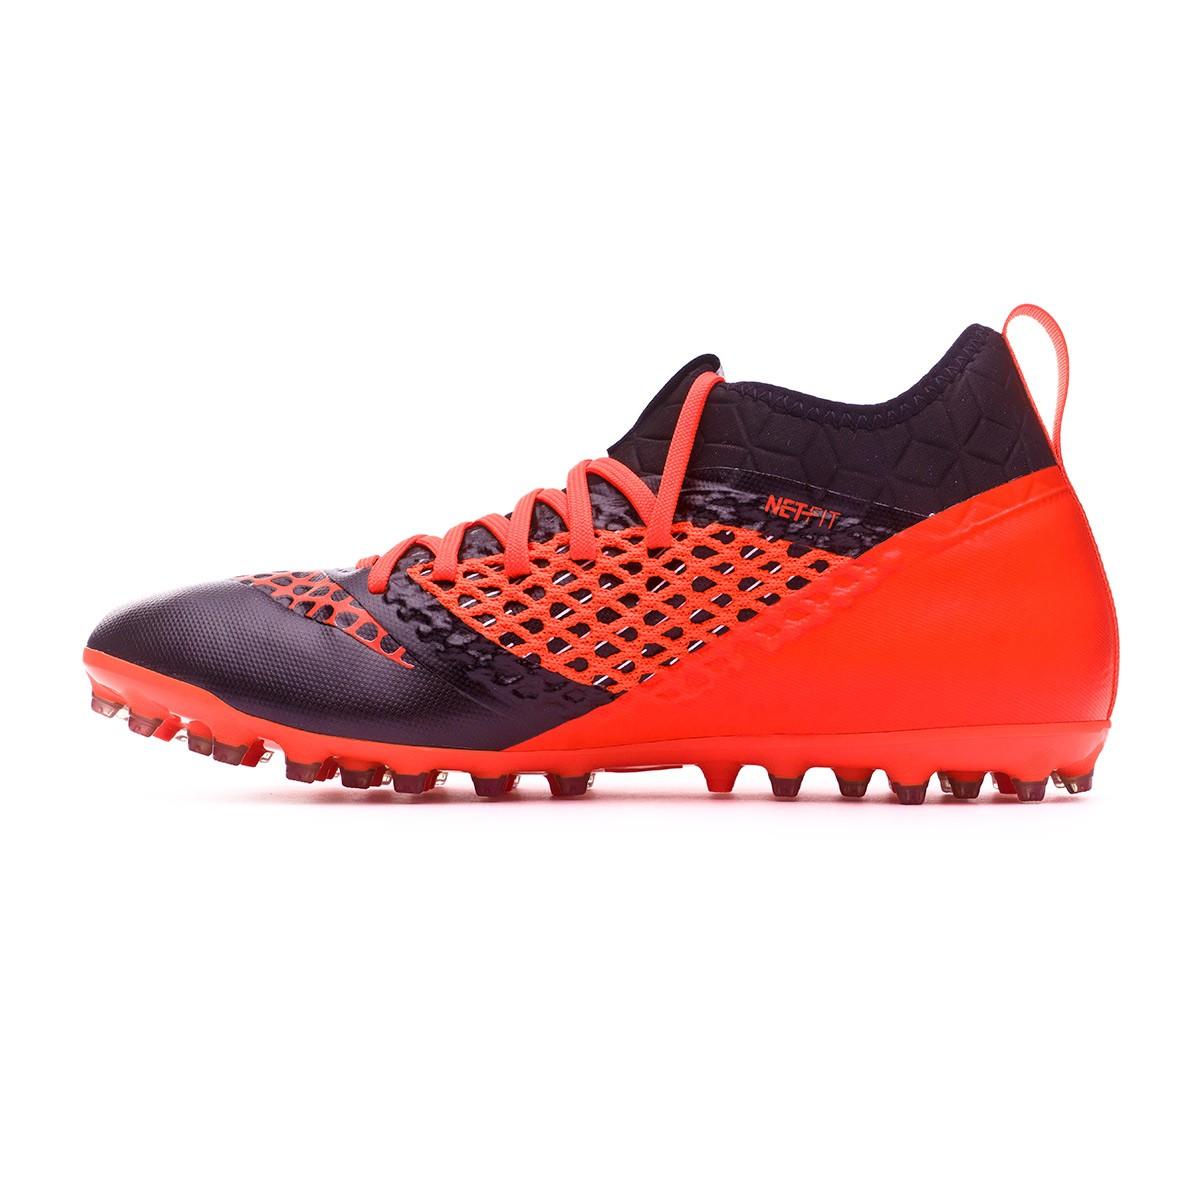 6e79d99d2 Football Boots Puma Future 2.3 Netfit MG Puma black-Shocking orange -  Tienda de fútbol Fútbol Emotion